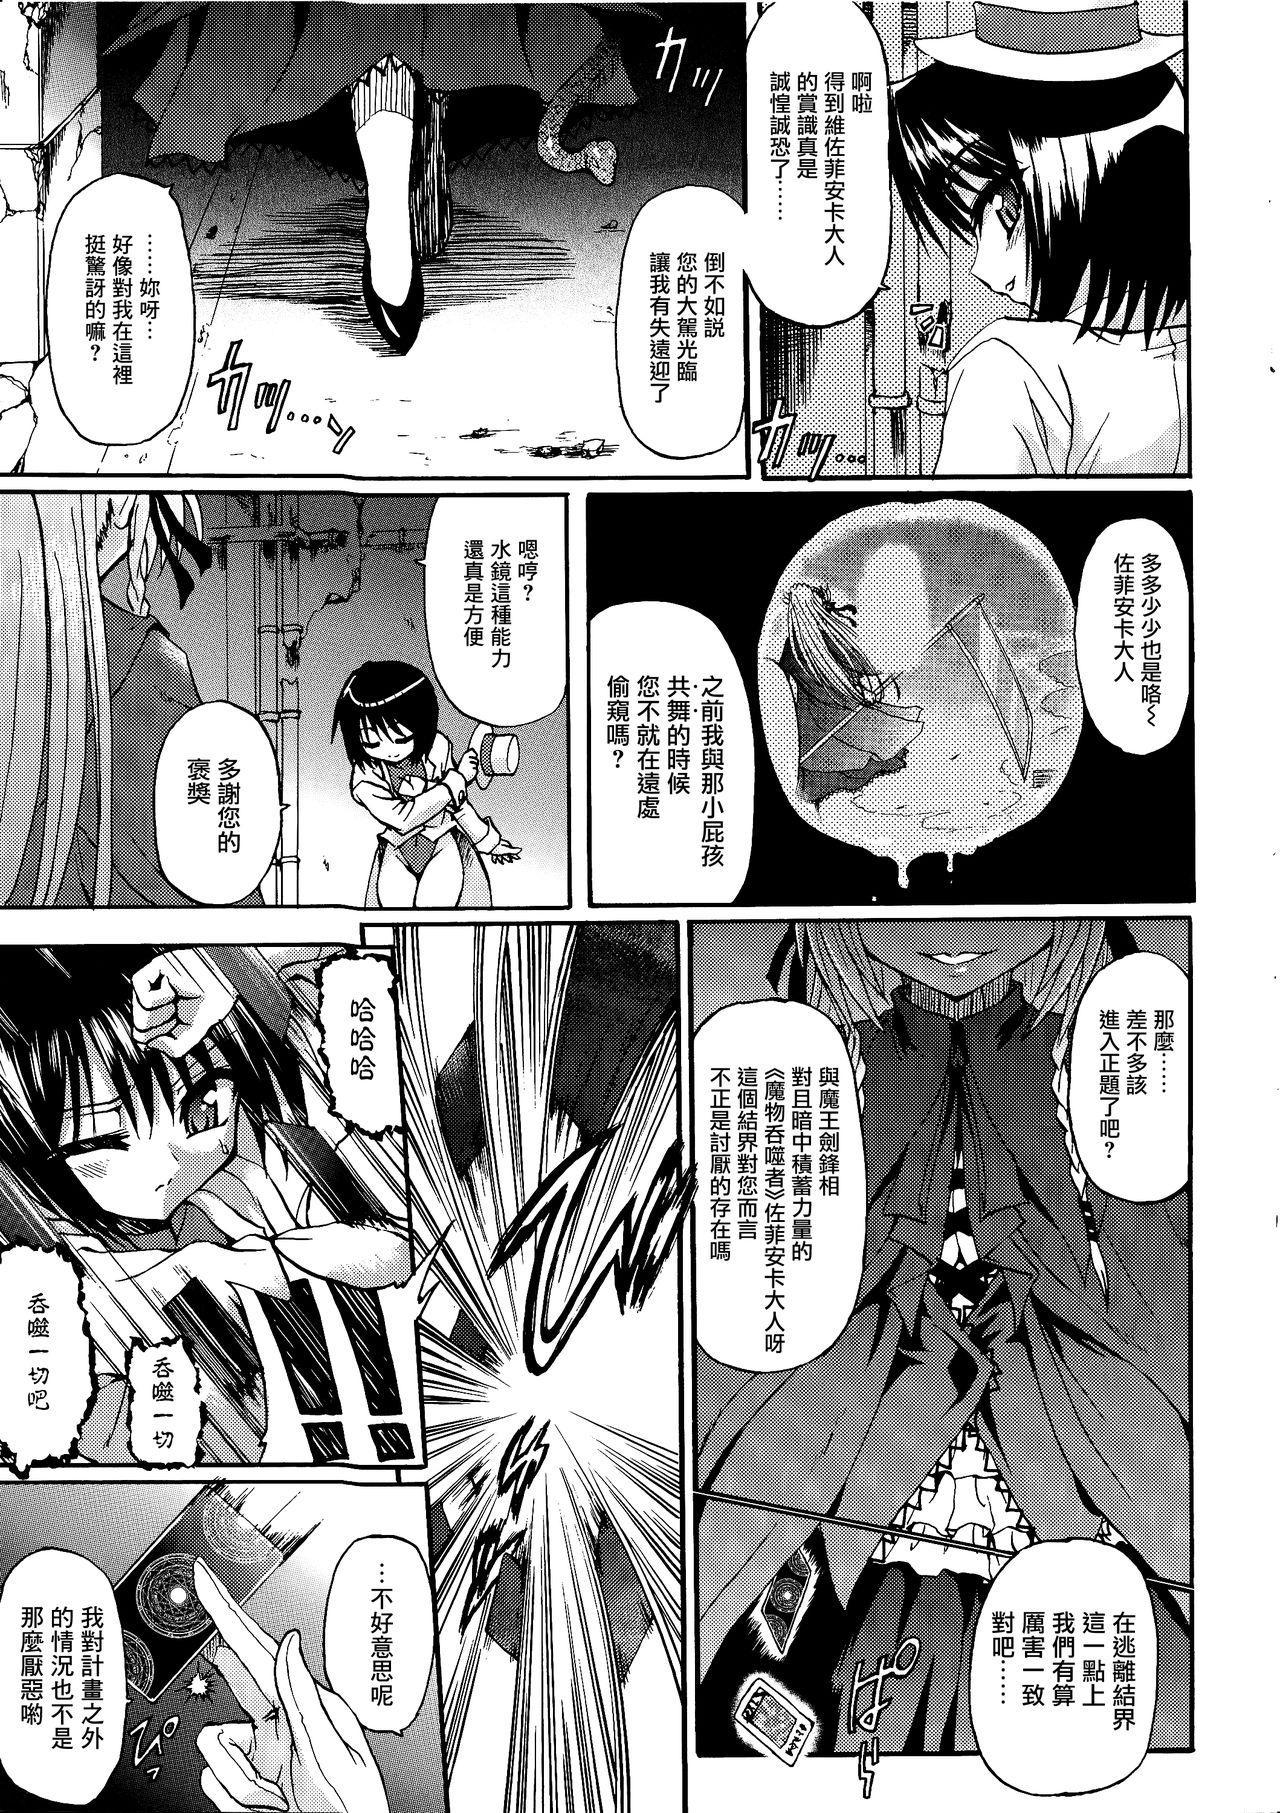 Ma ga Ochiru Yoru Demonic Imitator CH.1-7 77